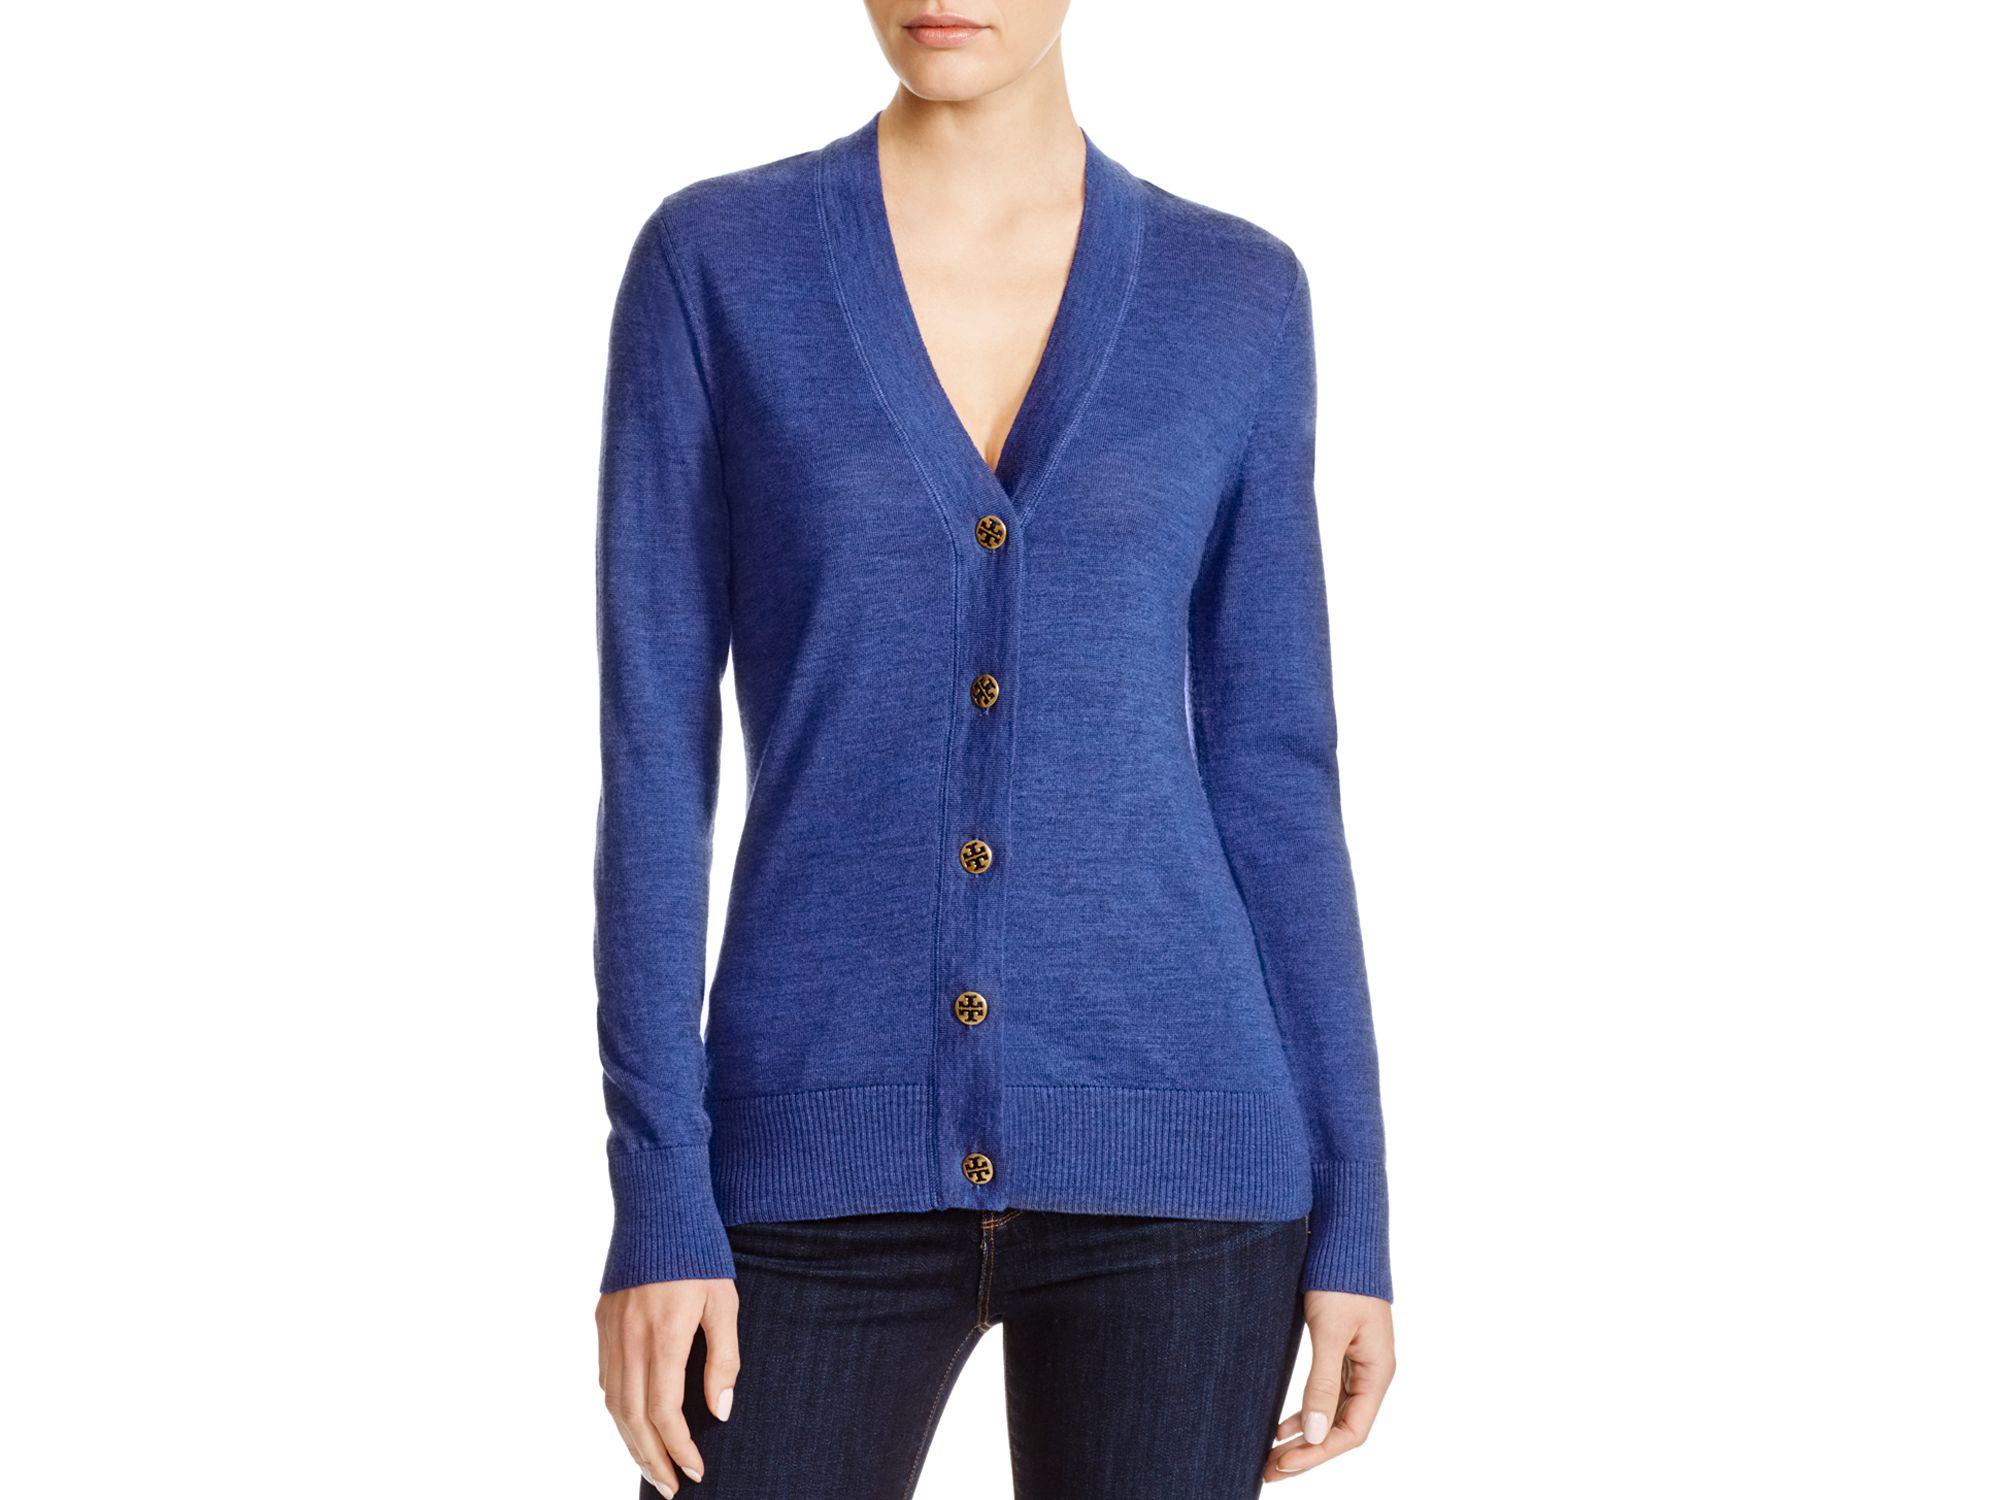 Tory burch Simone Merino Wool Cardigan in Blue | Lyst